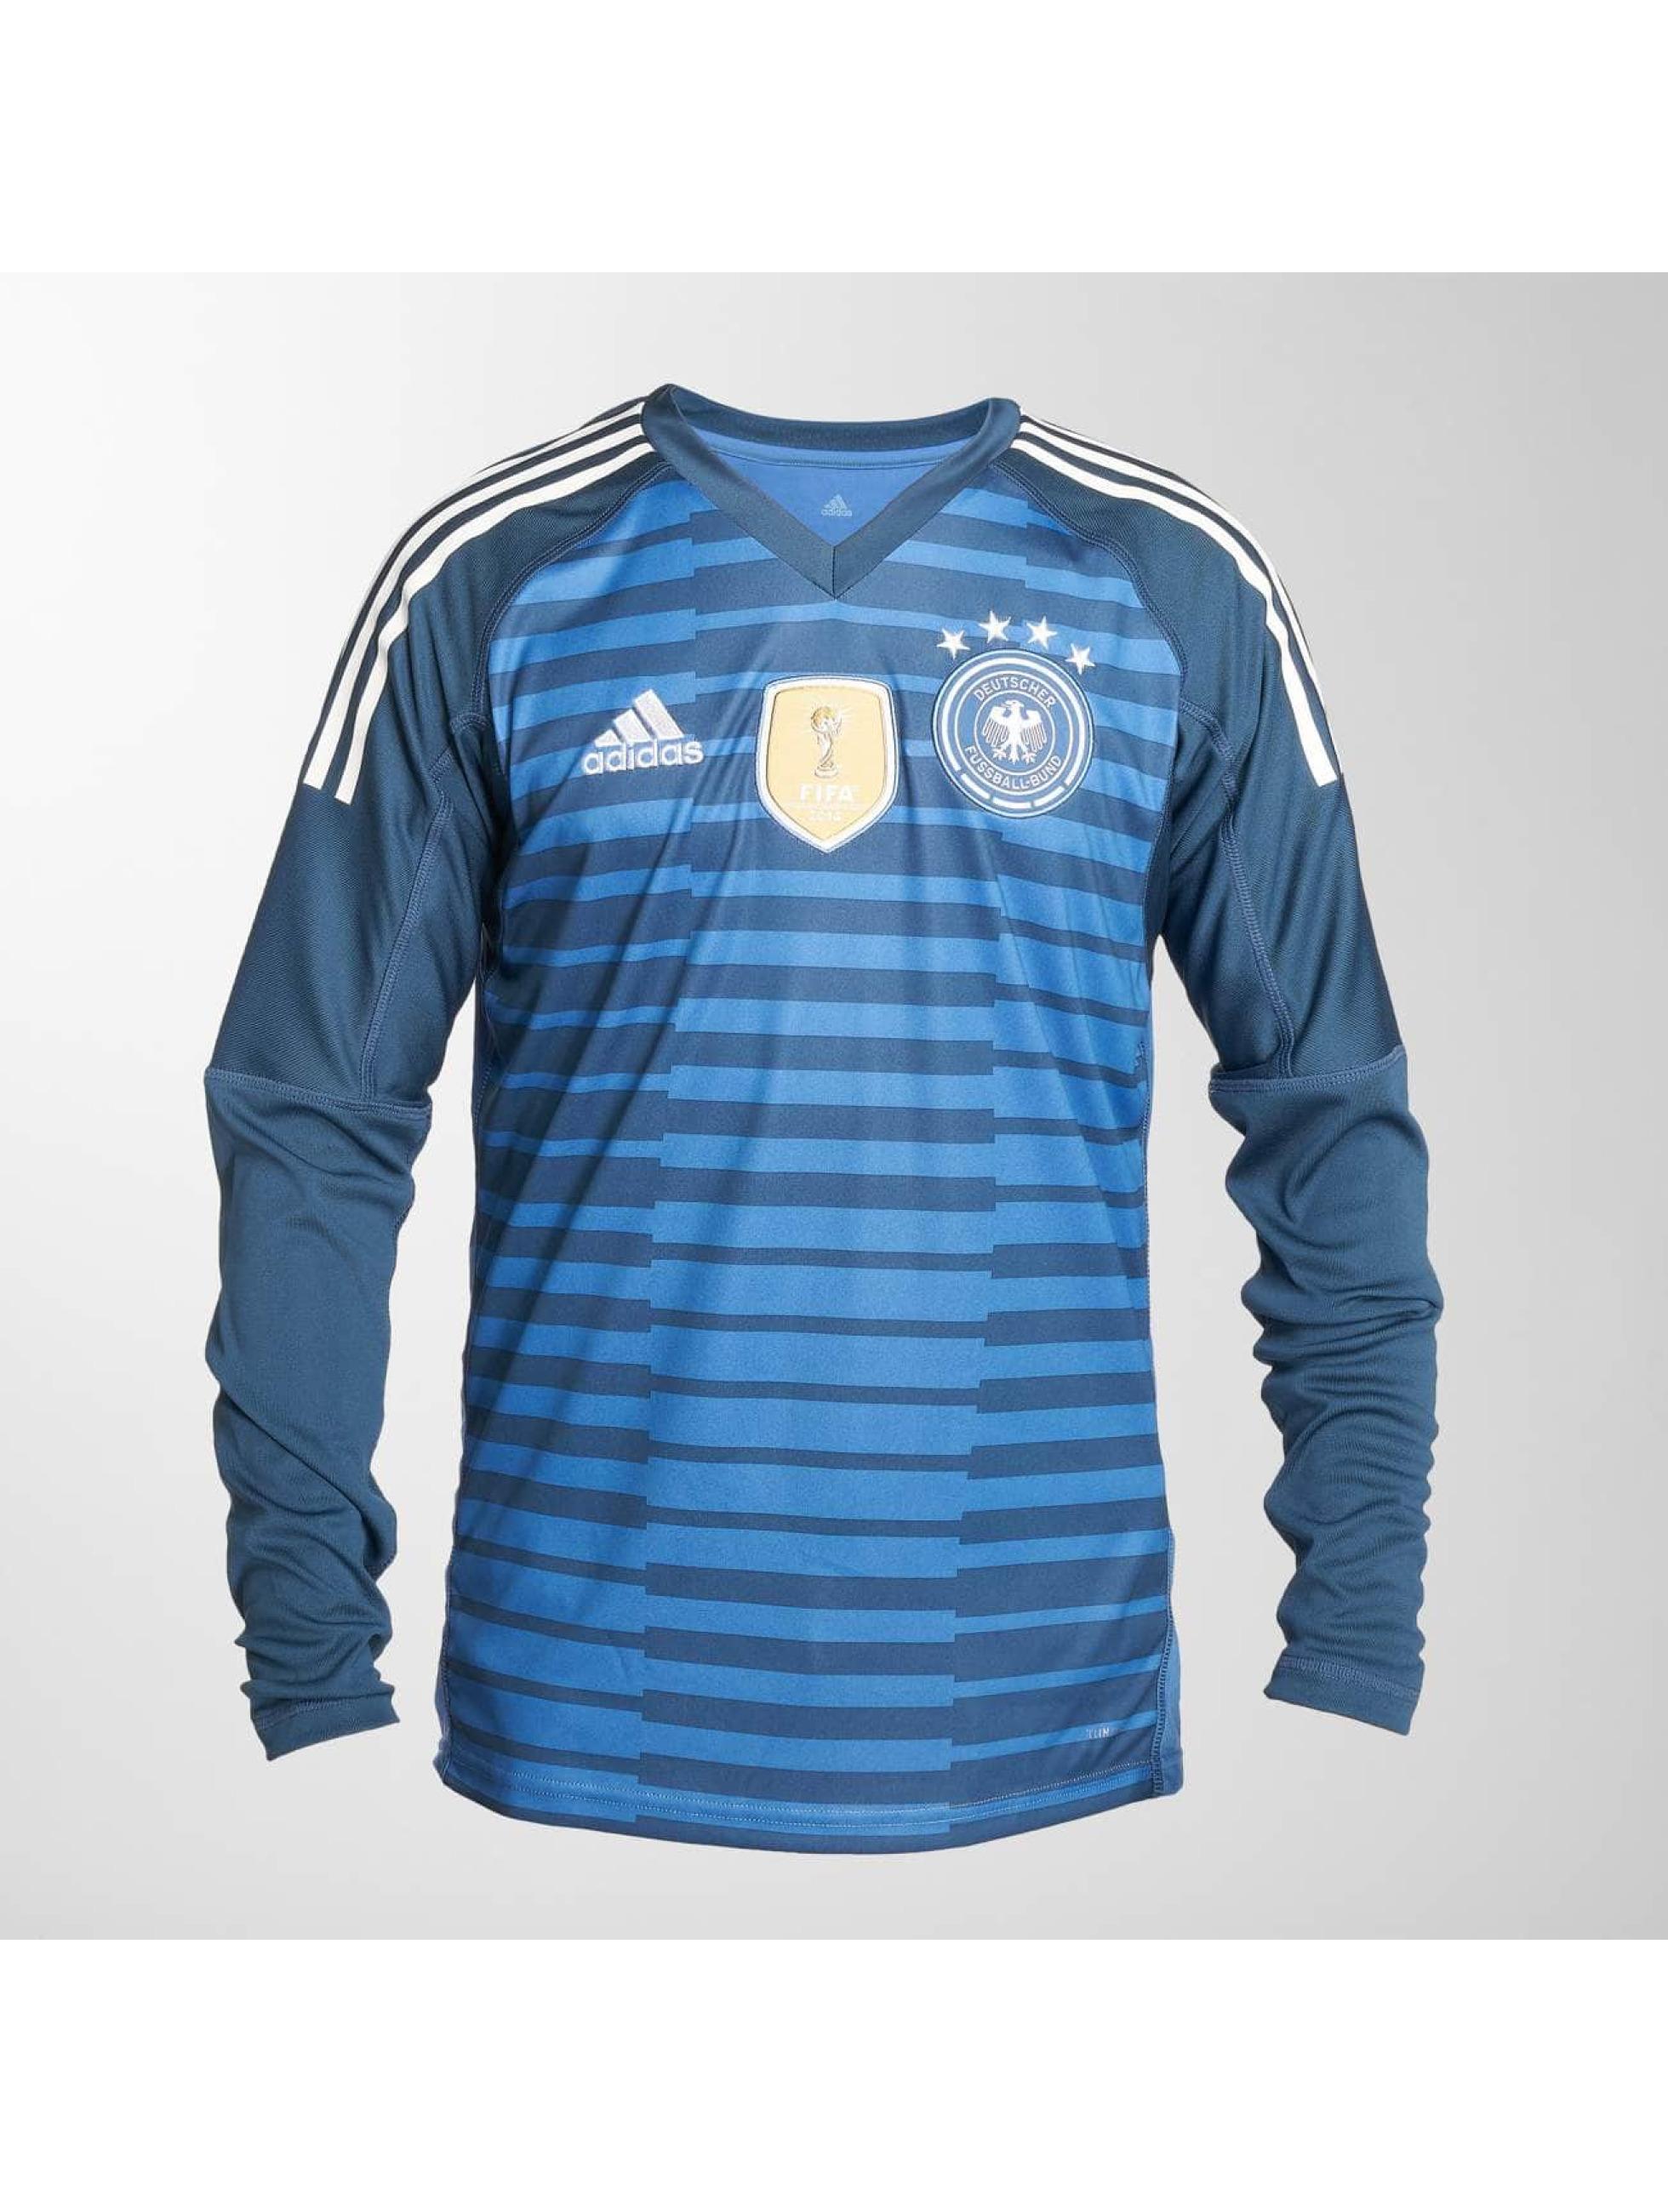 adidas Performance Trikot DFB Home Jersey blau